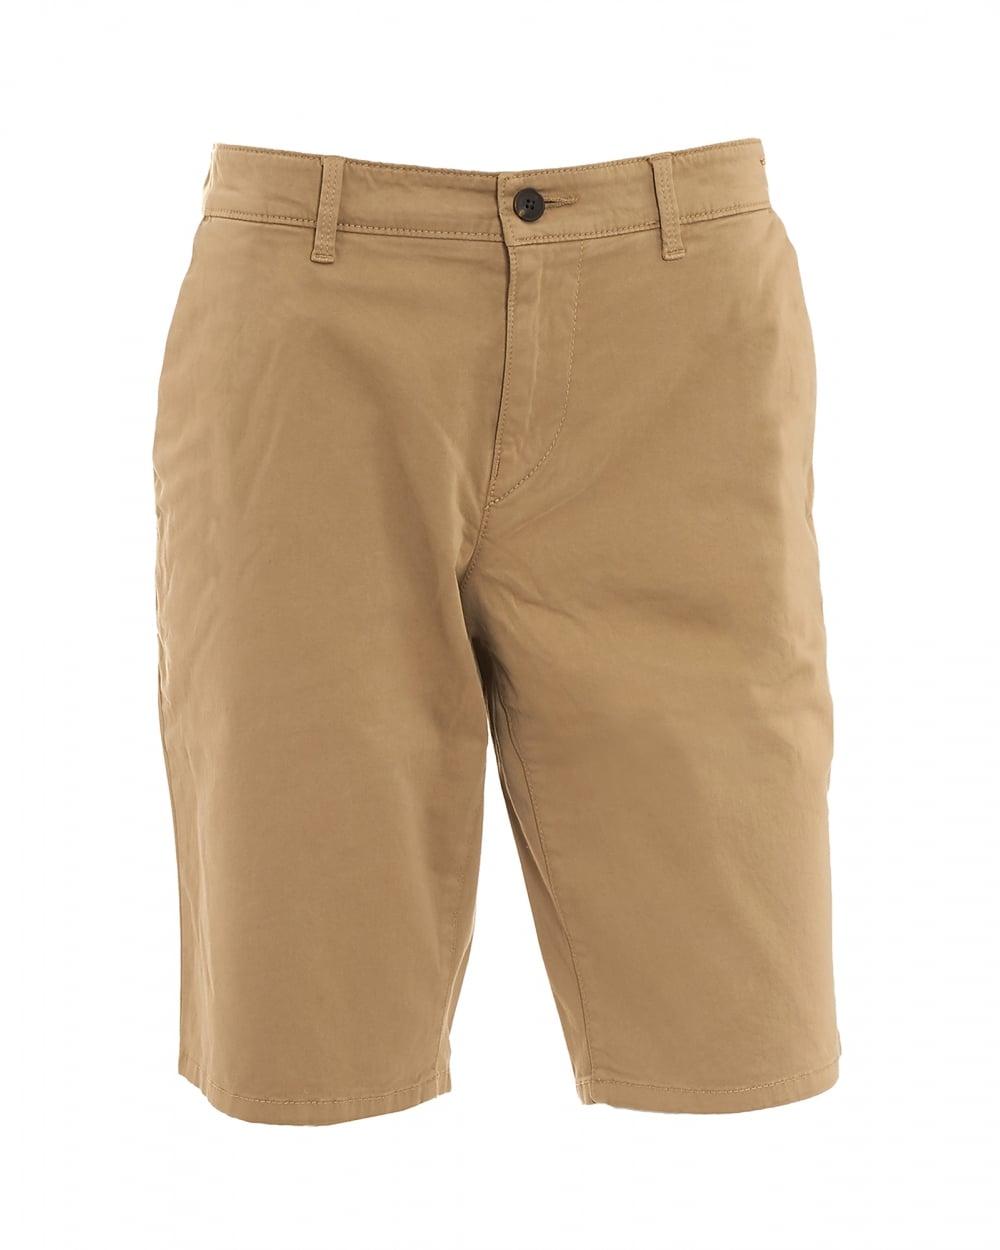 hugo boss orange mens schino slim shorts d slim fit chino. Black Bedroom Furniture Sets. Home Design Ideas